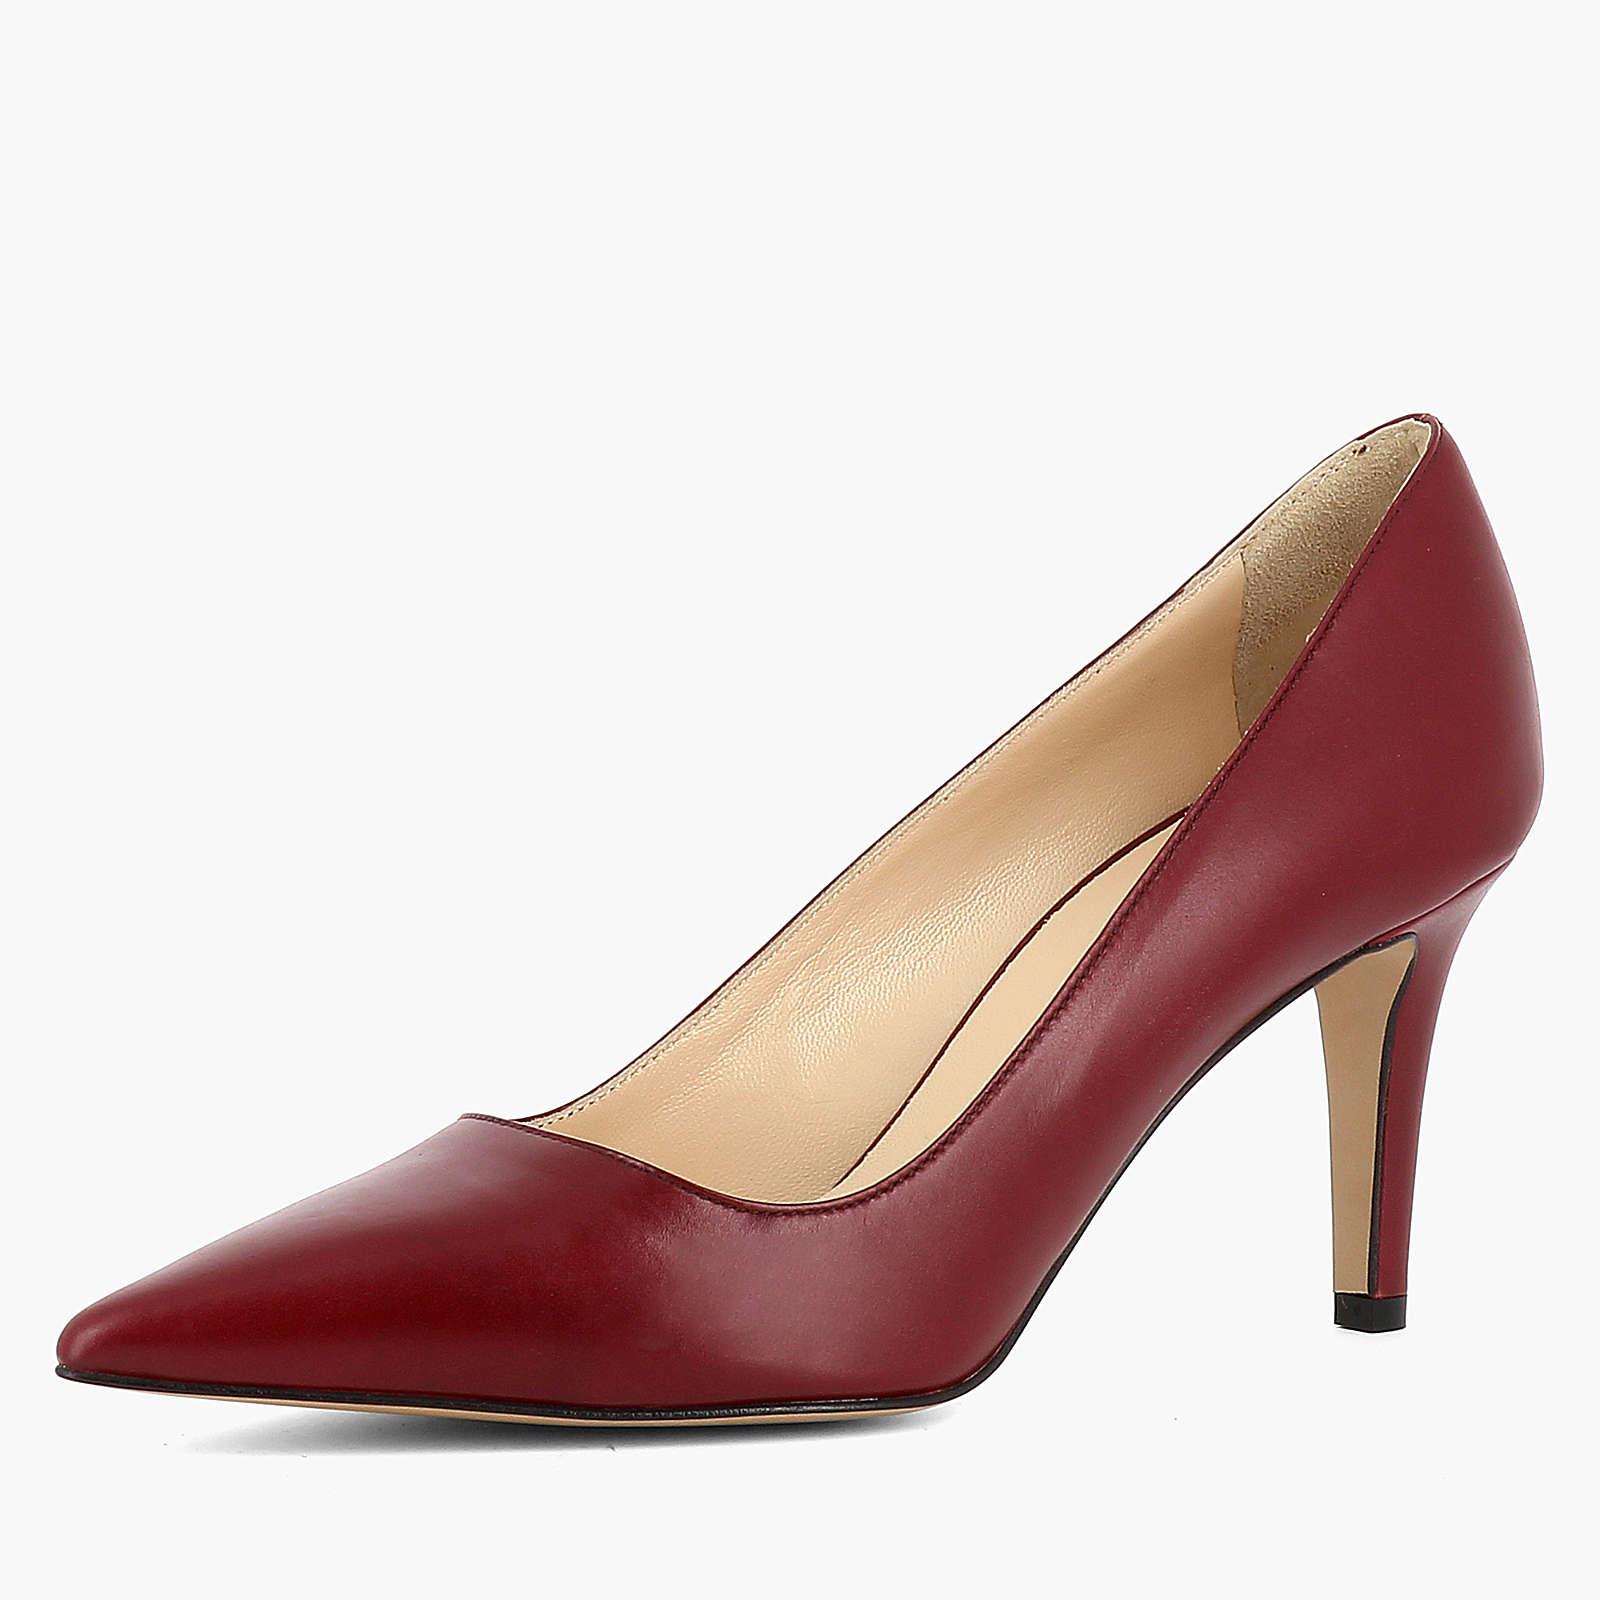 Evita Shoes JESSICA Klassische Pumps dunkelrot Damen Gr. 41